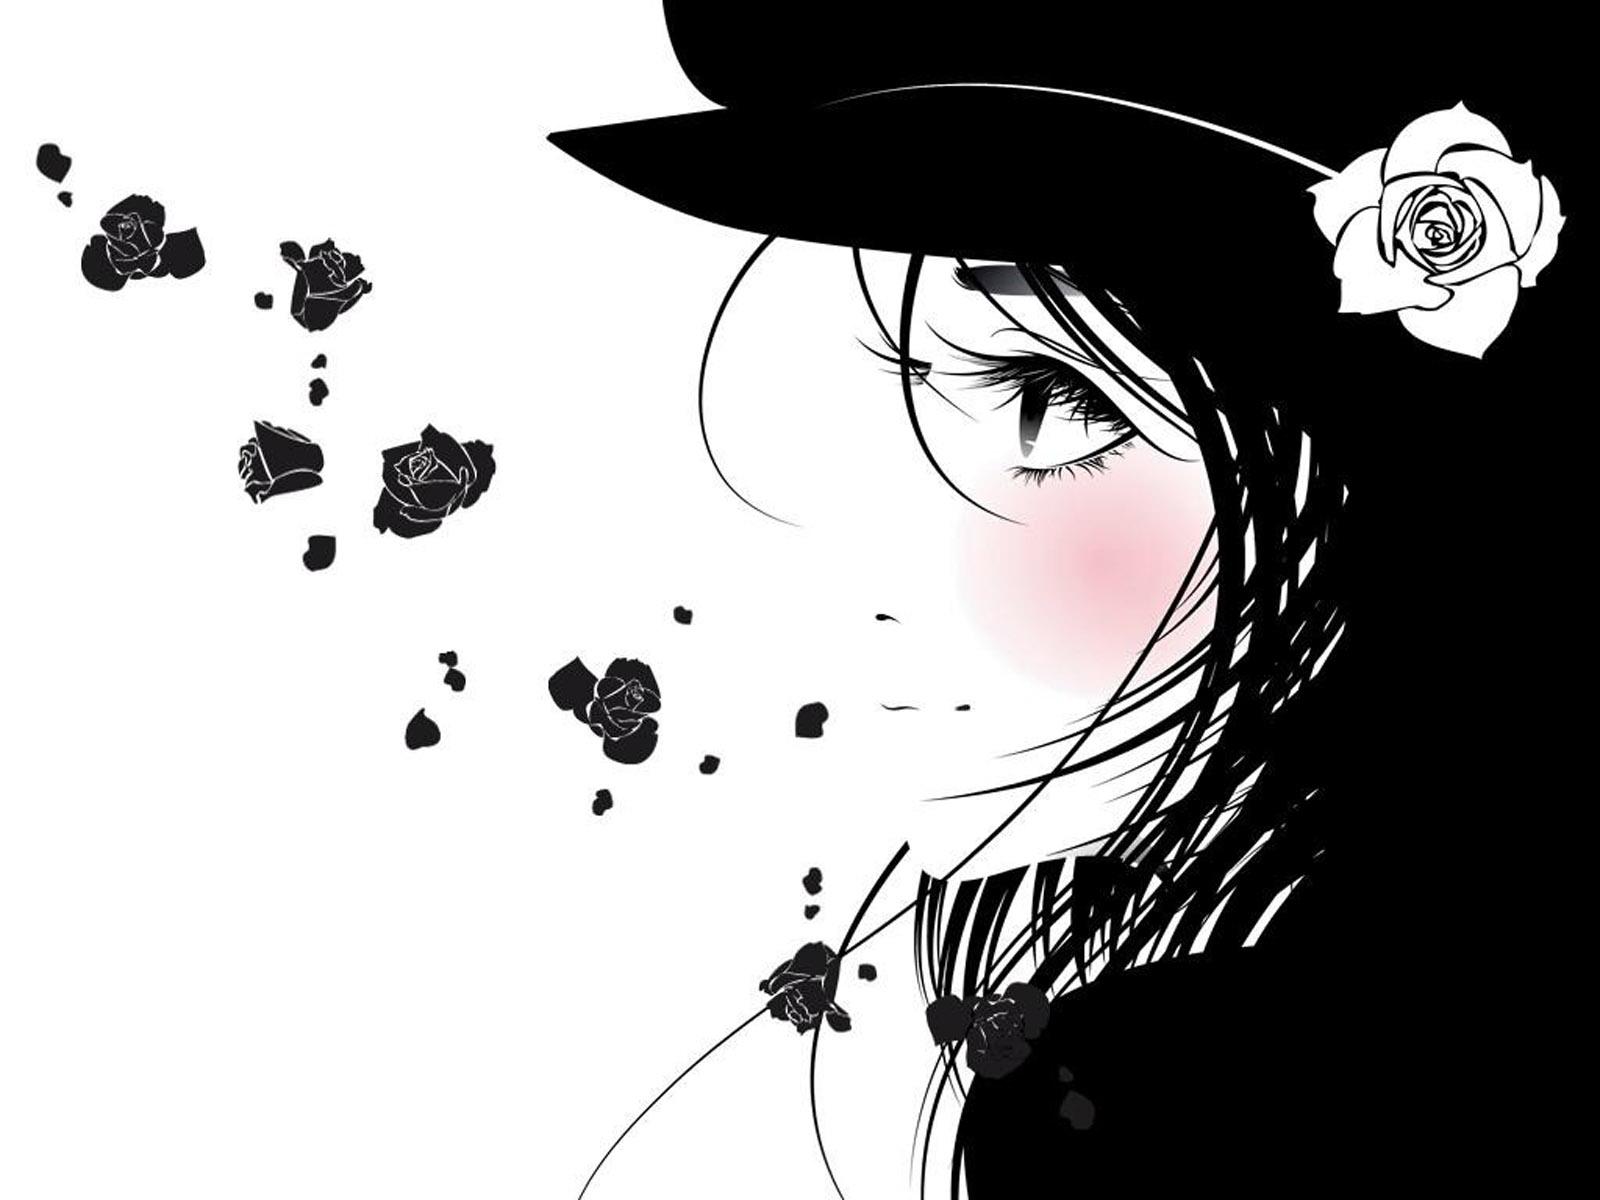 http://3.bp.blogspot.com/-G_f7cfScr6M/TV0bjWqiA4I/AAAAAAAASbA/7L9g4O8-sfc/s1600/anime-Desktop-wallpaper.jpg